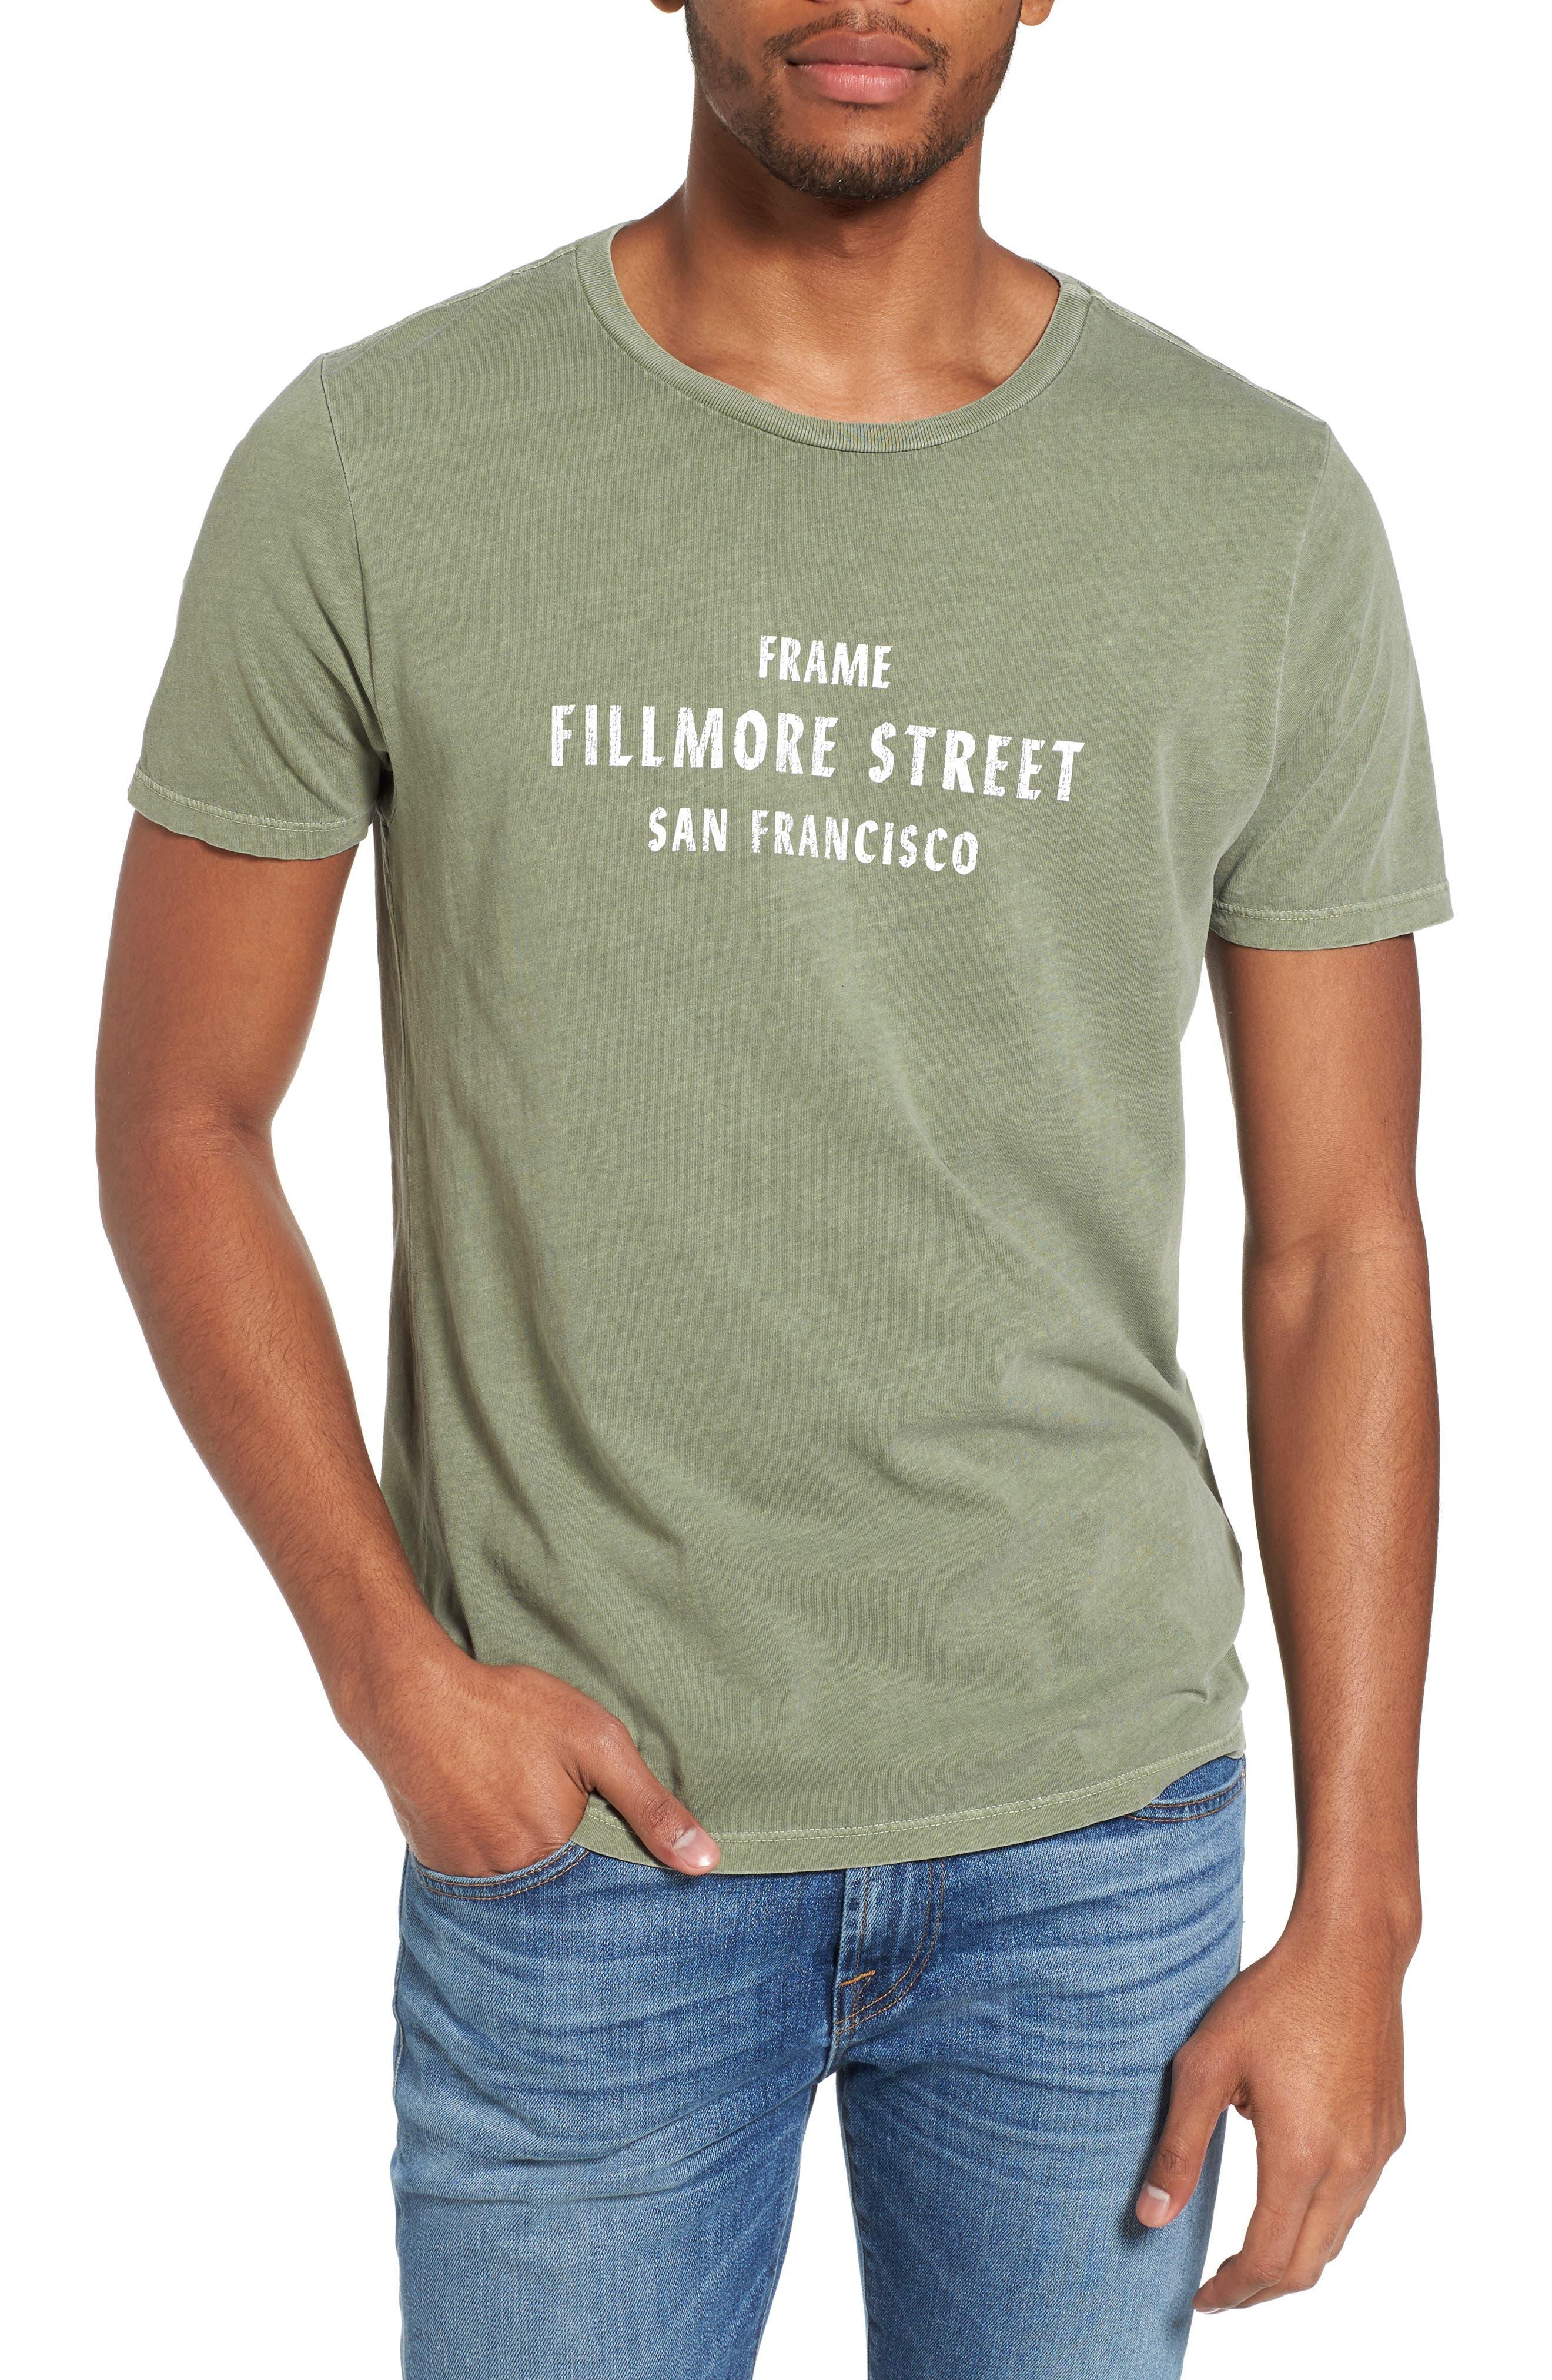 FRAME Fillmore Street Vintage Graphic T-Shirt